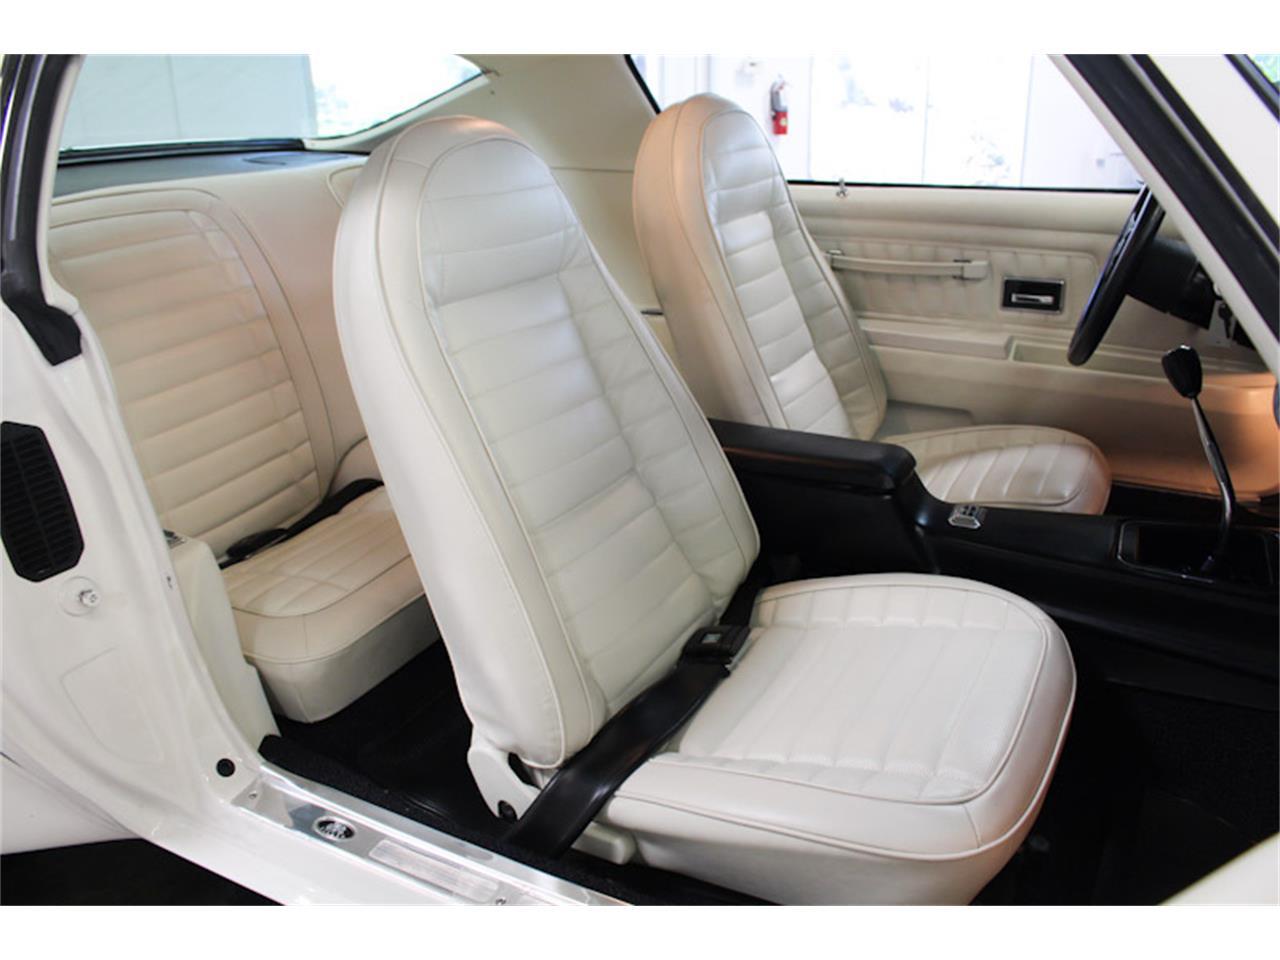 Large Picture of Classic '72 Pontiac Firebird located in California - $129,990.00 - QQZ8